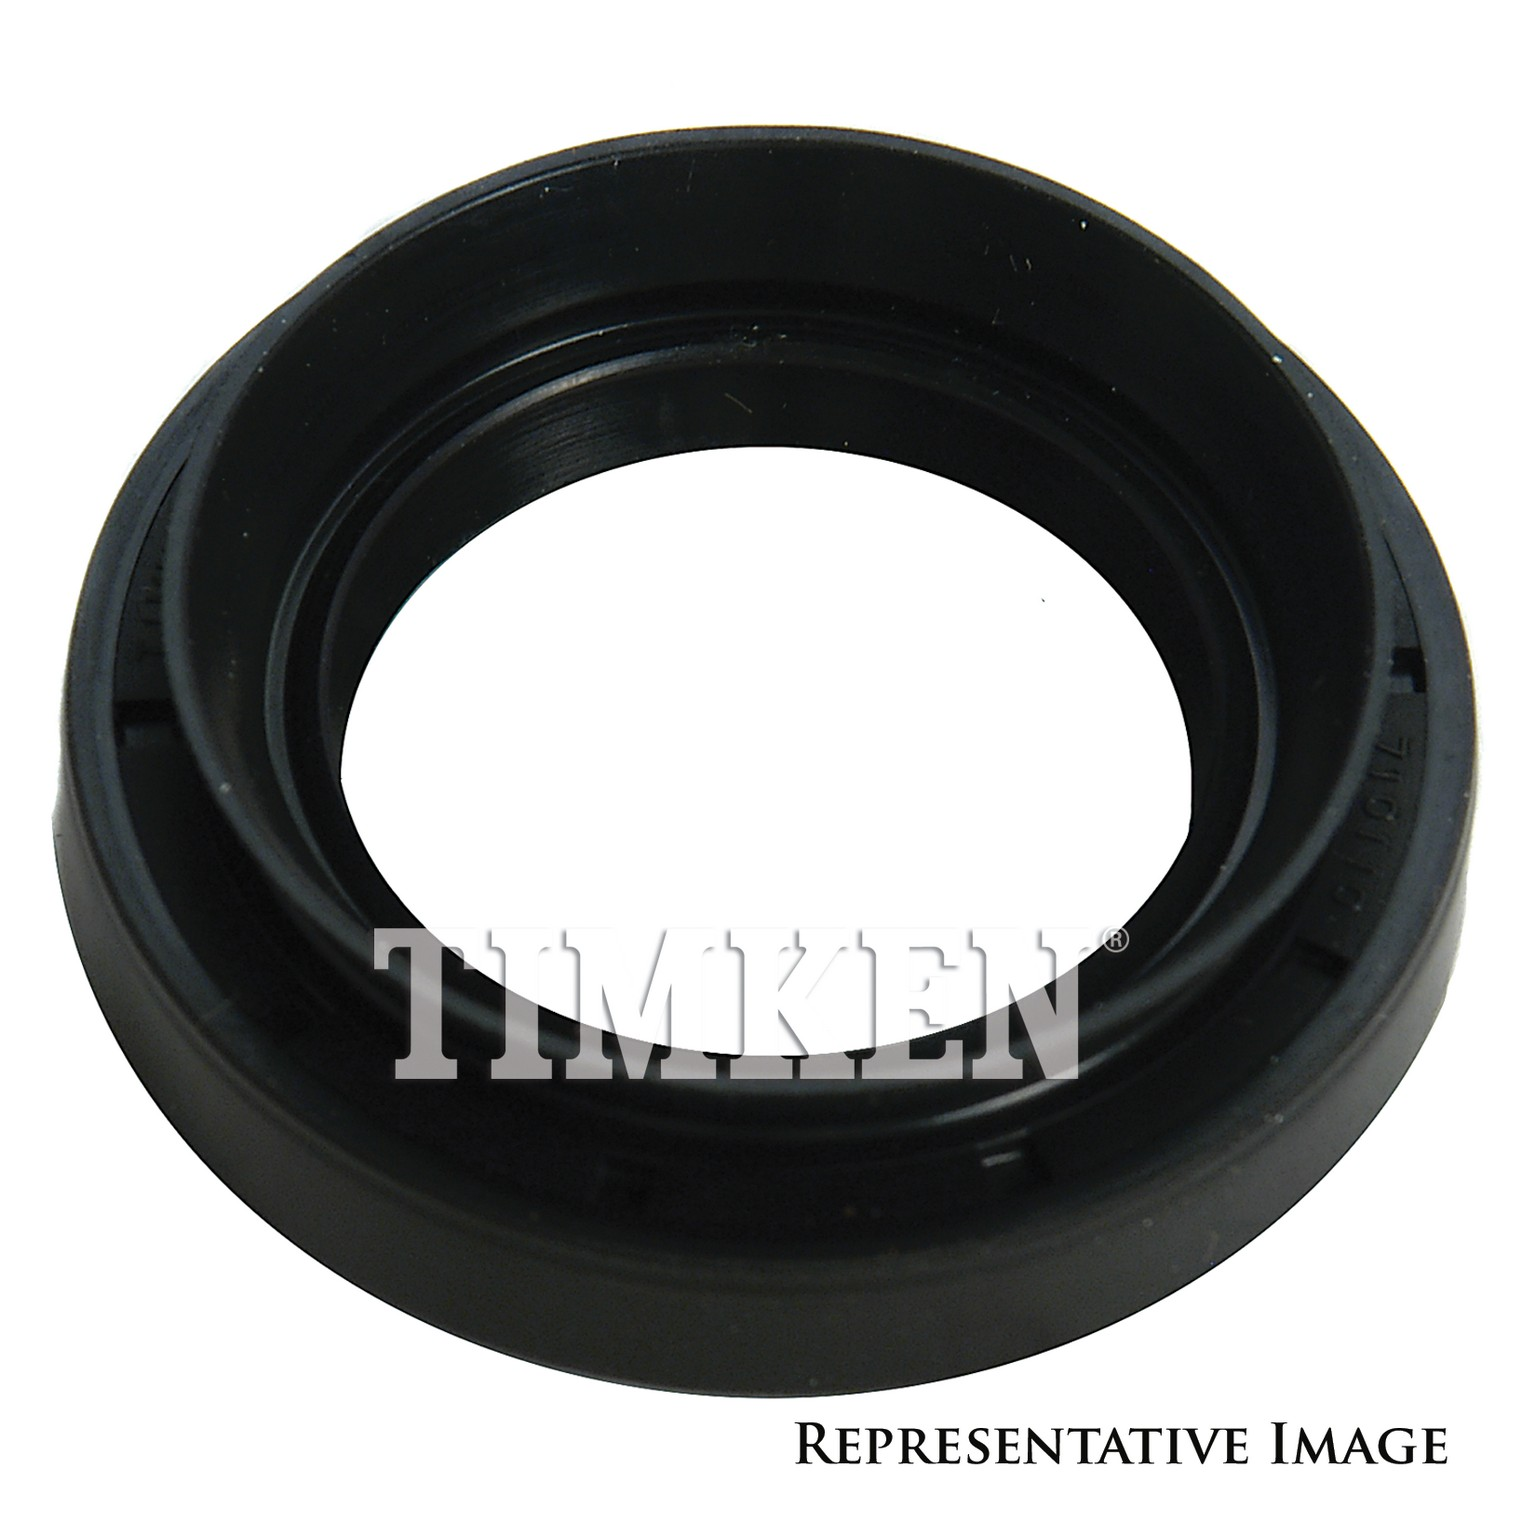 1994 Nissan Maxima Manual Transmission Output Shaft Seal TM 710118